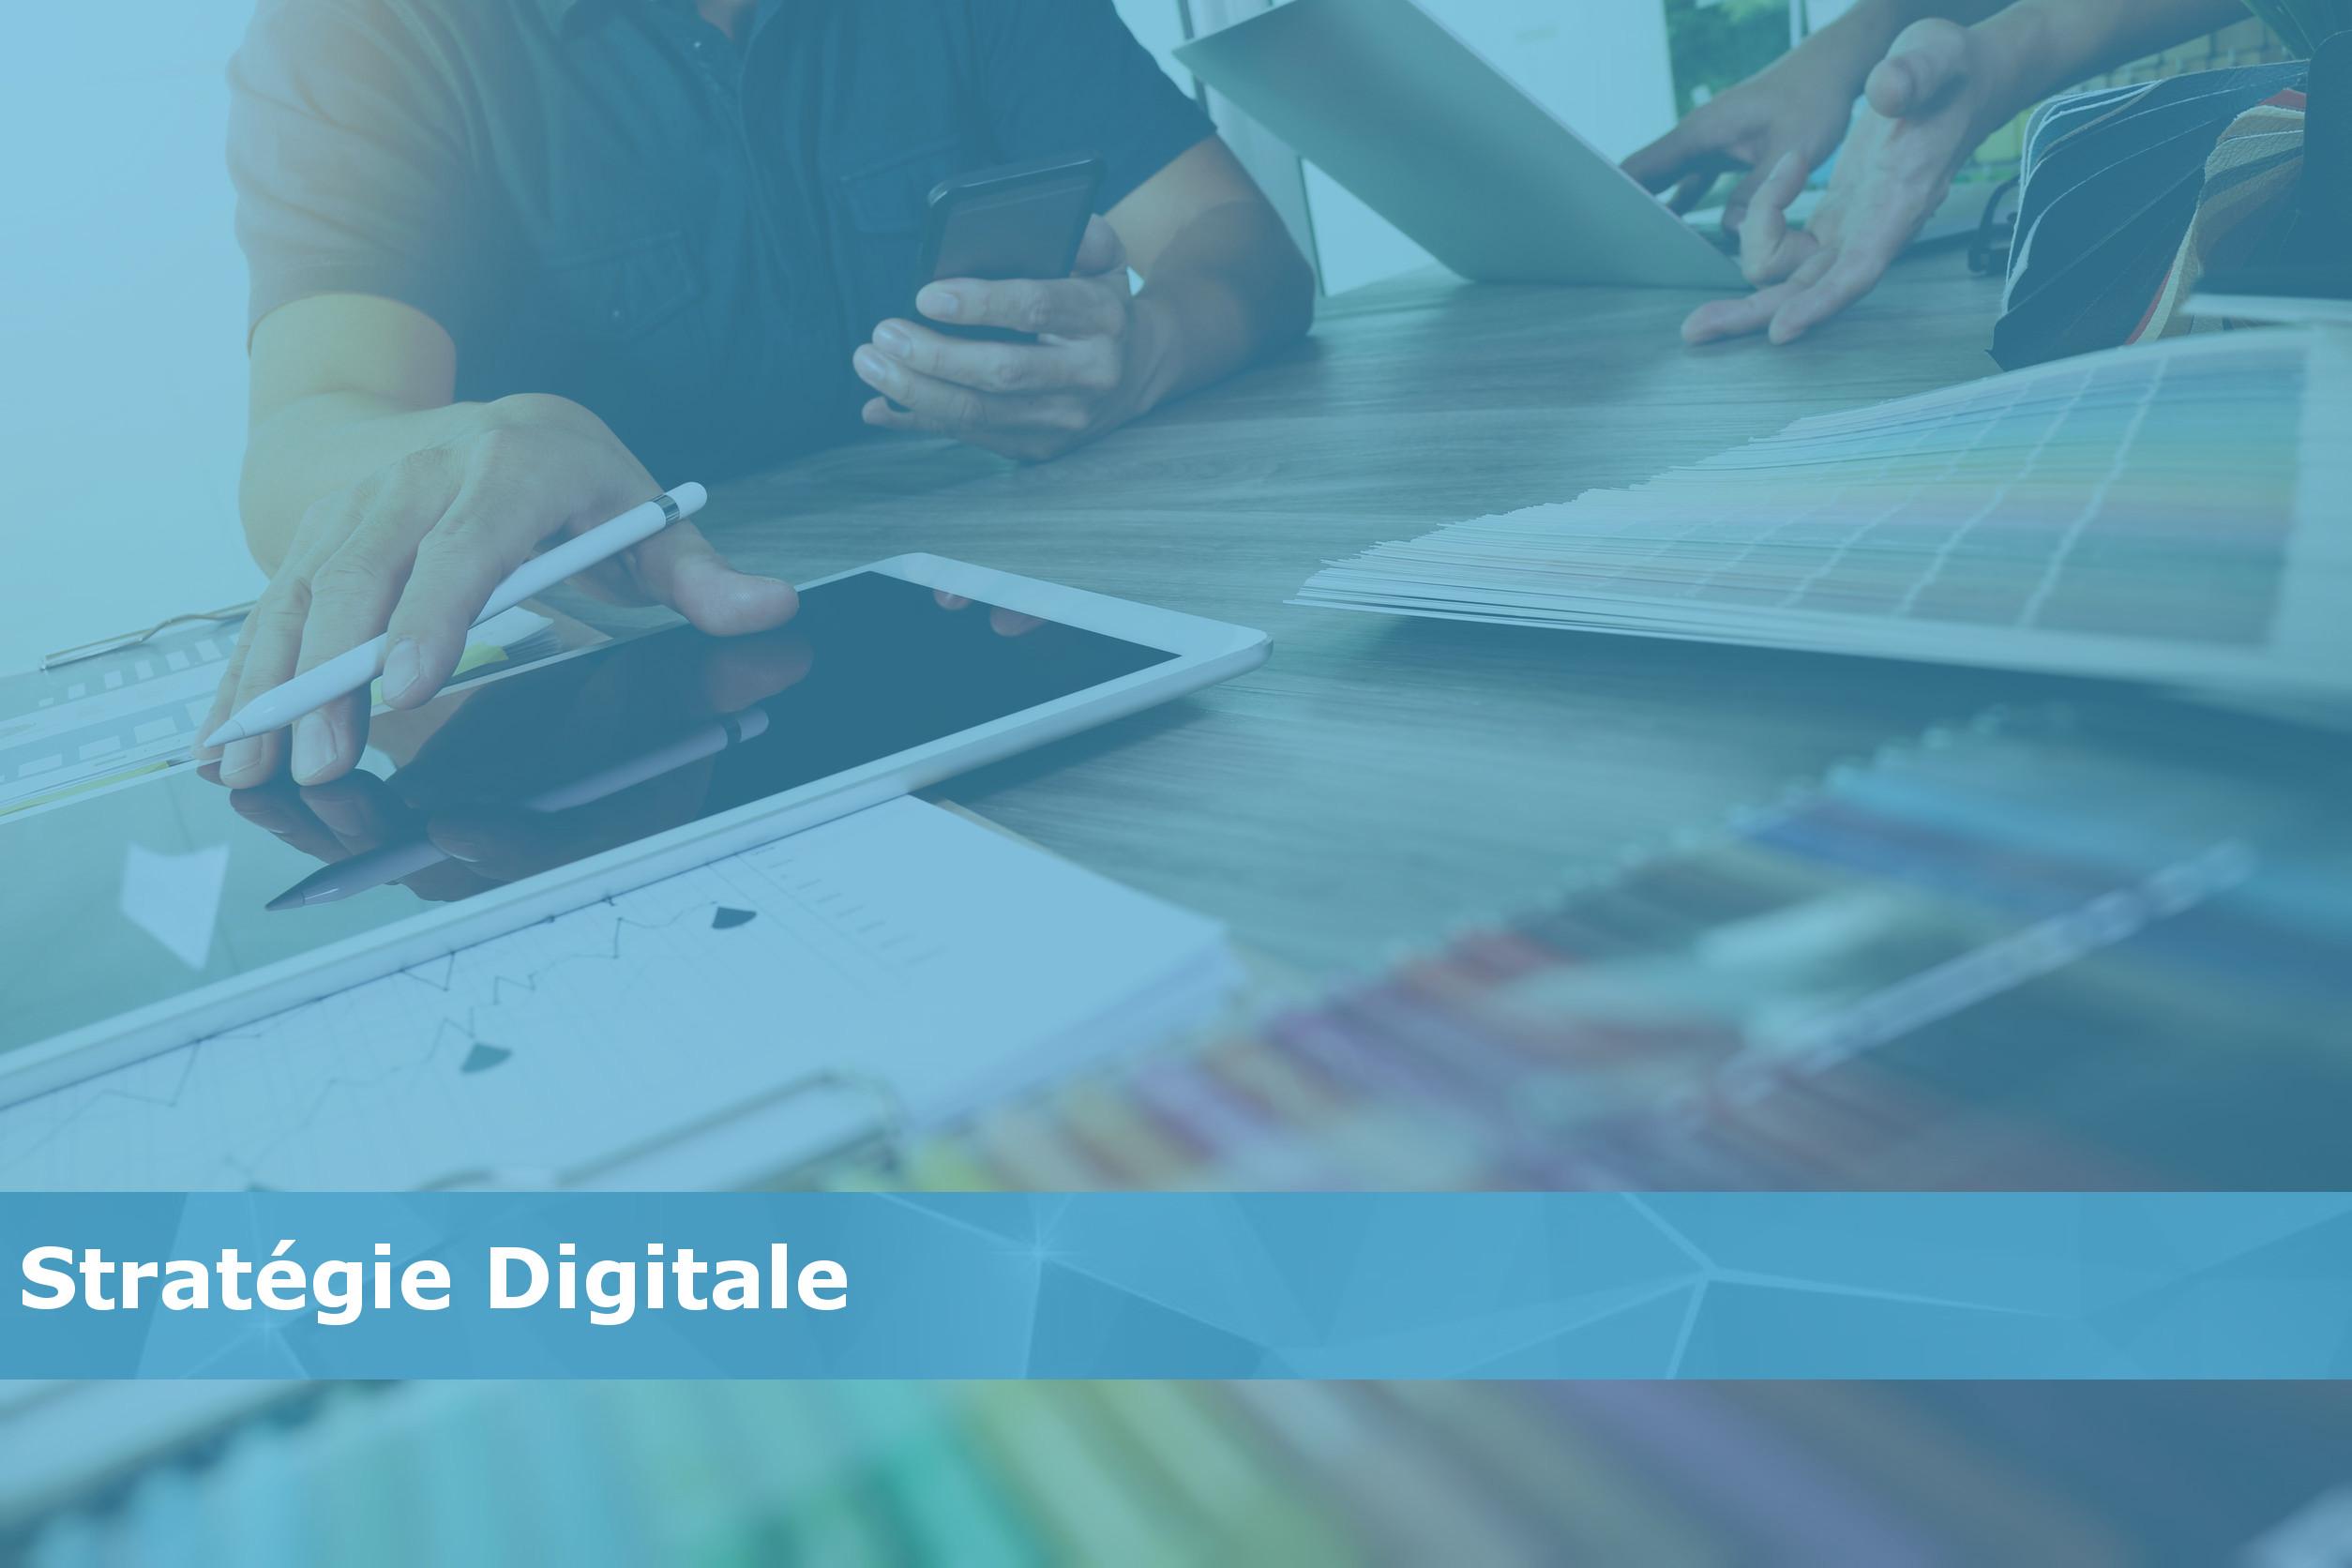 strategie-digitale-cta-blue